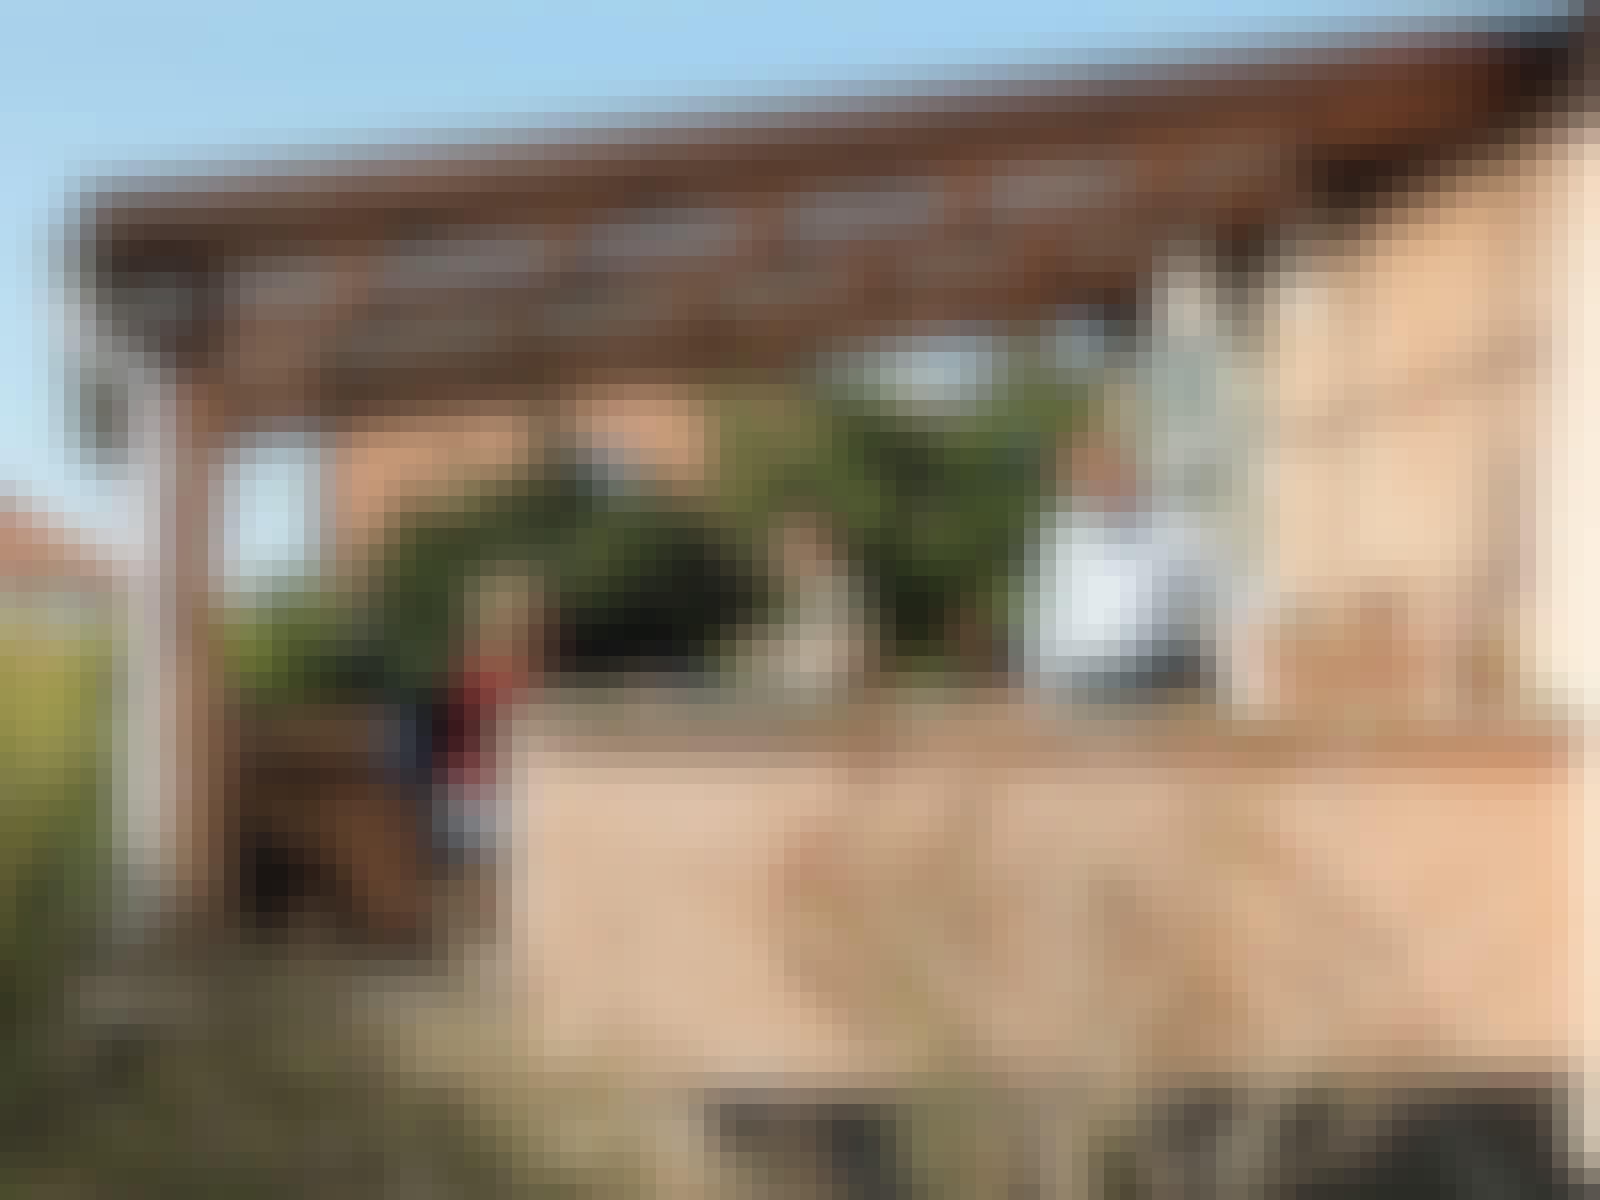 overbygd terrasse uten beslag